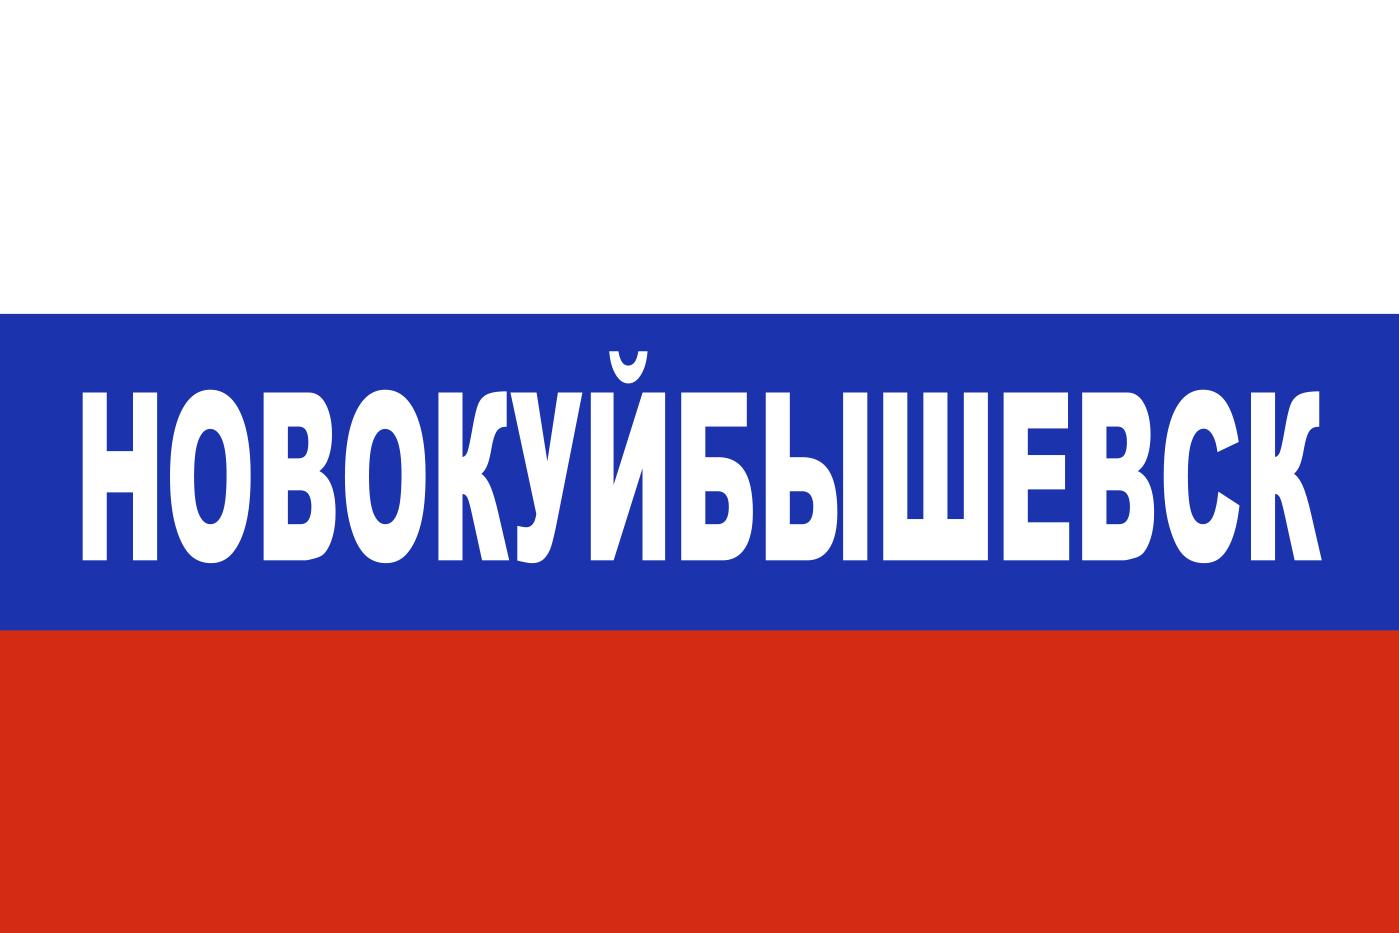 Флаг триколор Новокуйбышевск